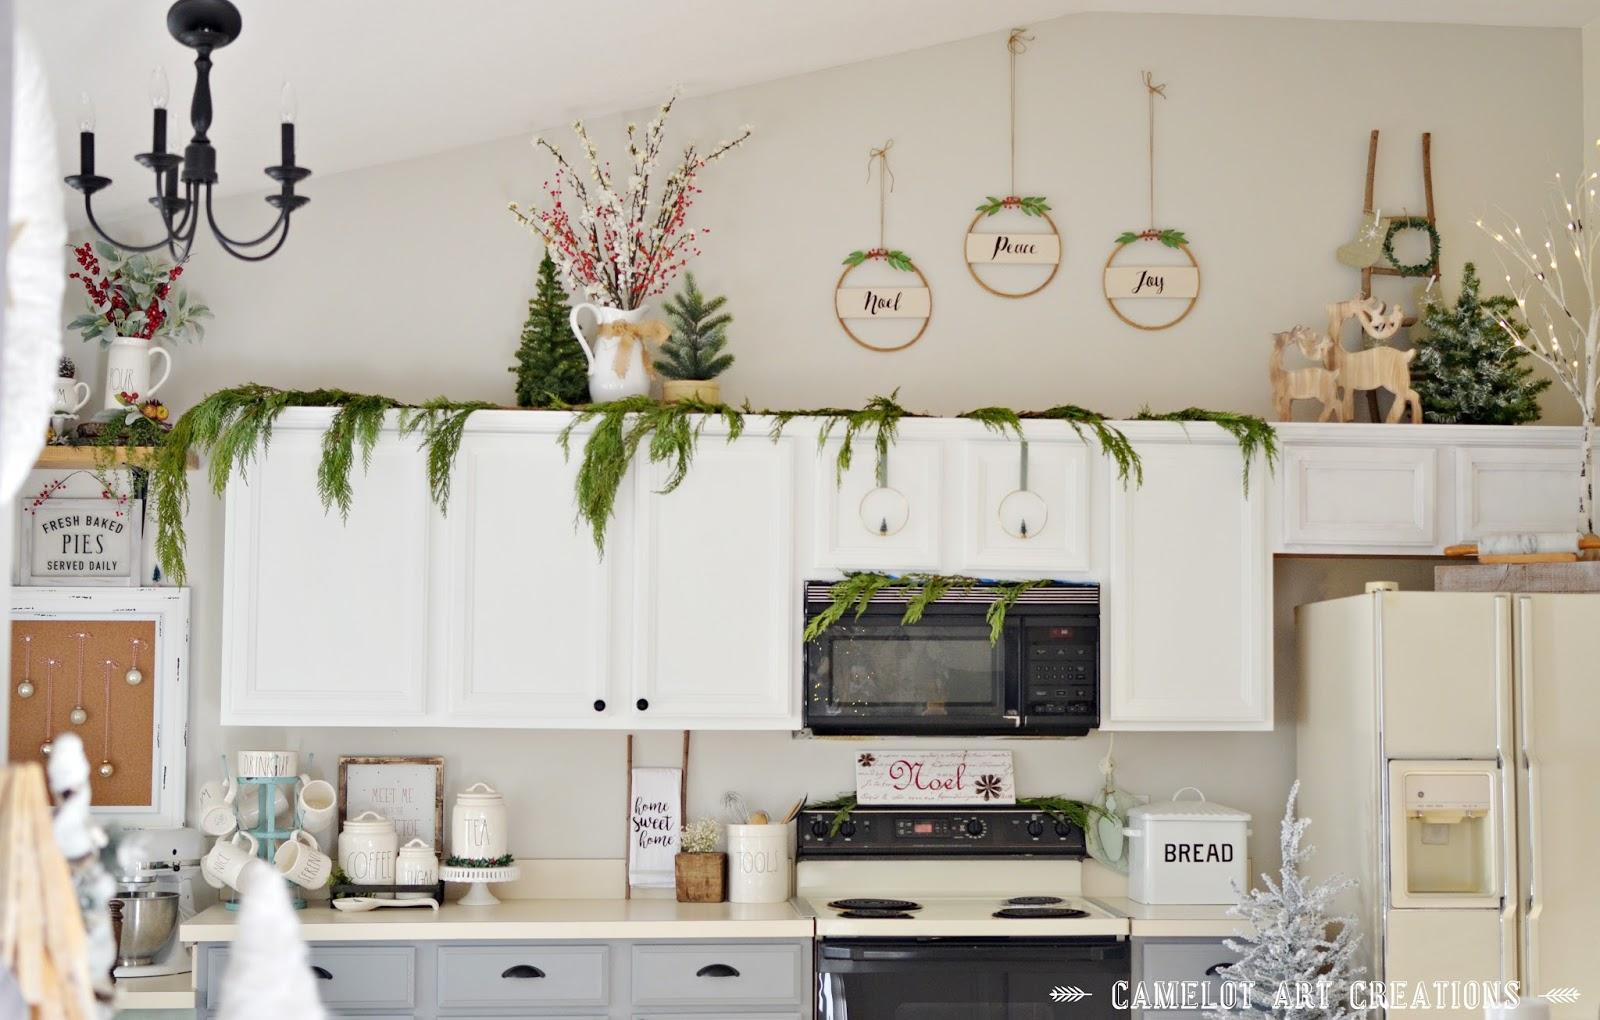 Camelot Art Creations: Merry & Bright Blog Hop: Christmas Kitchen